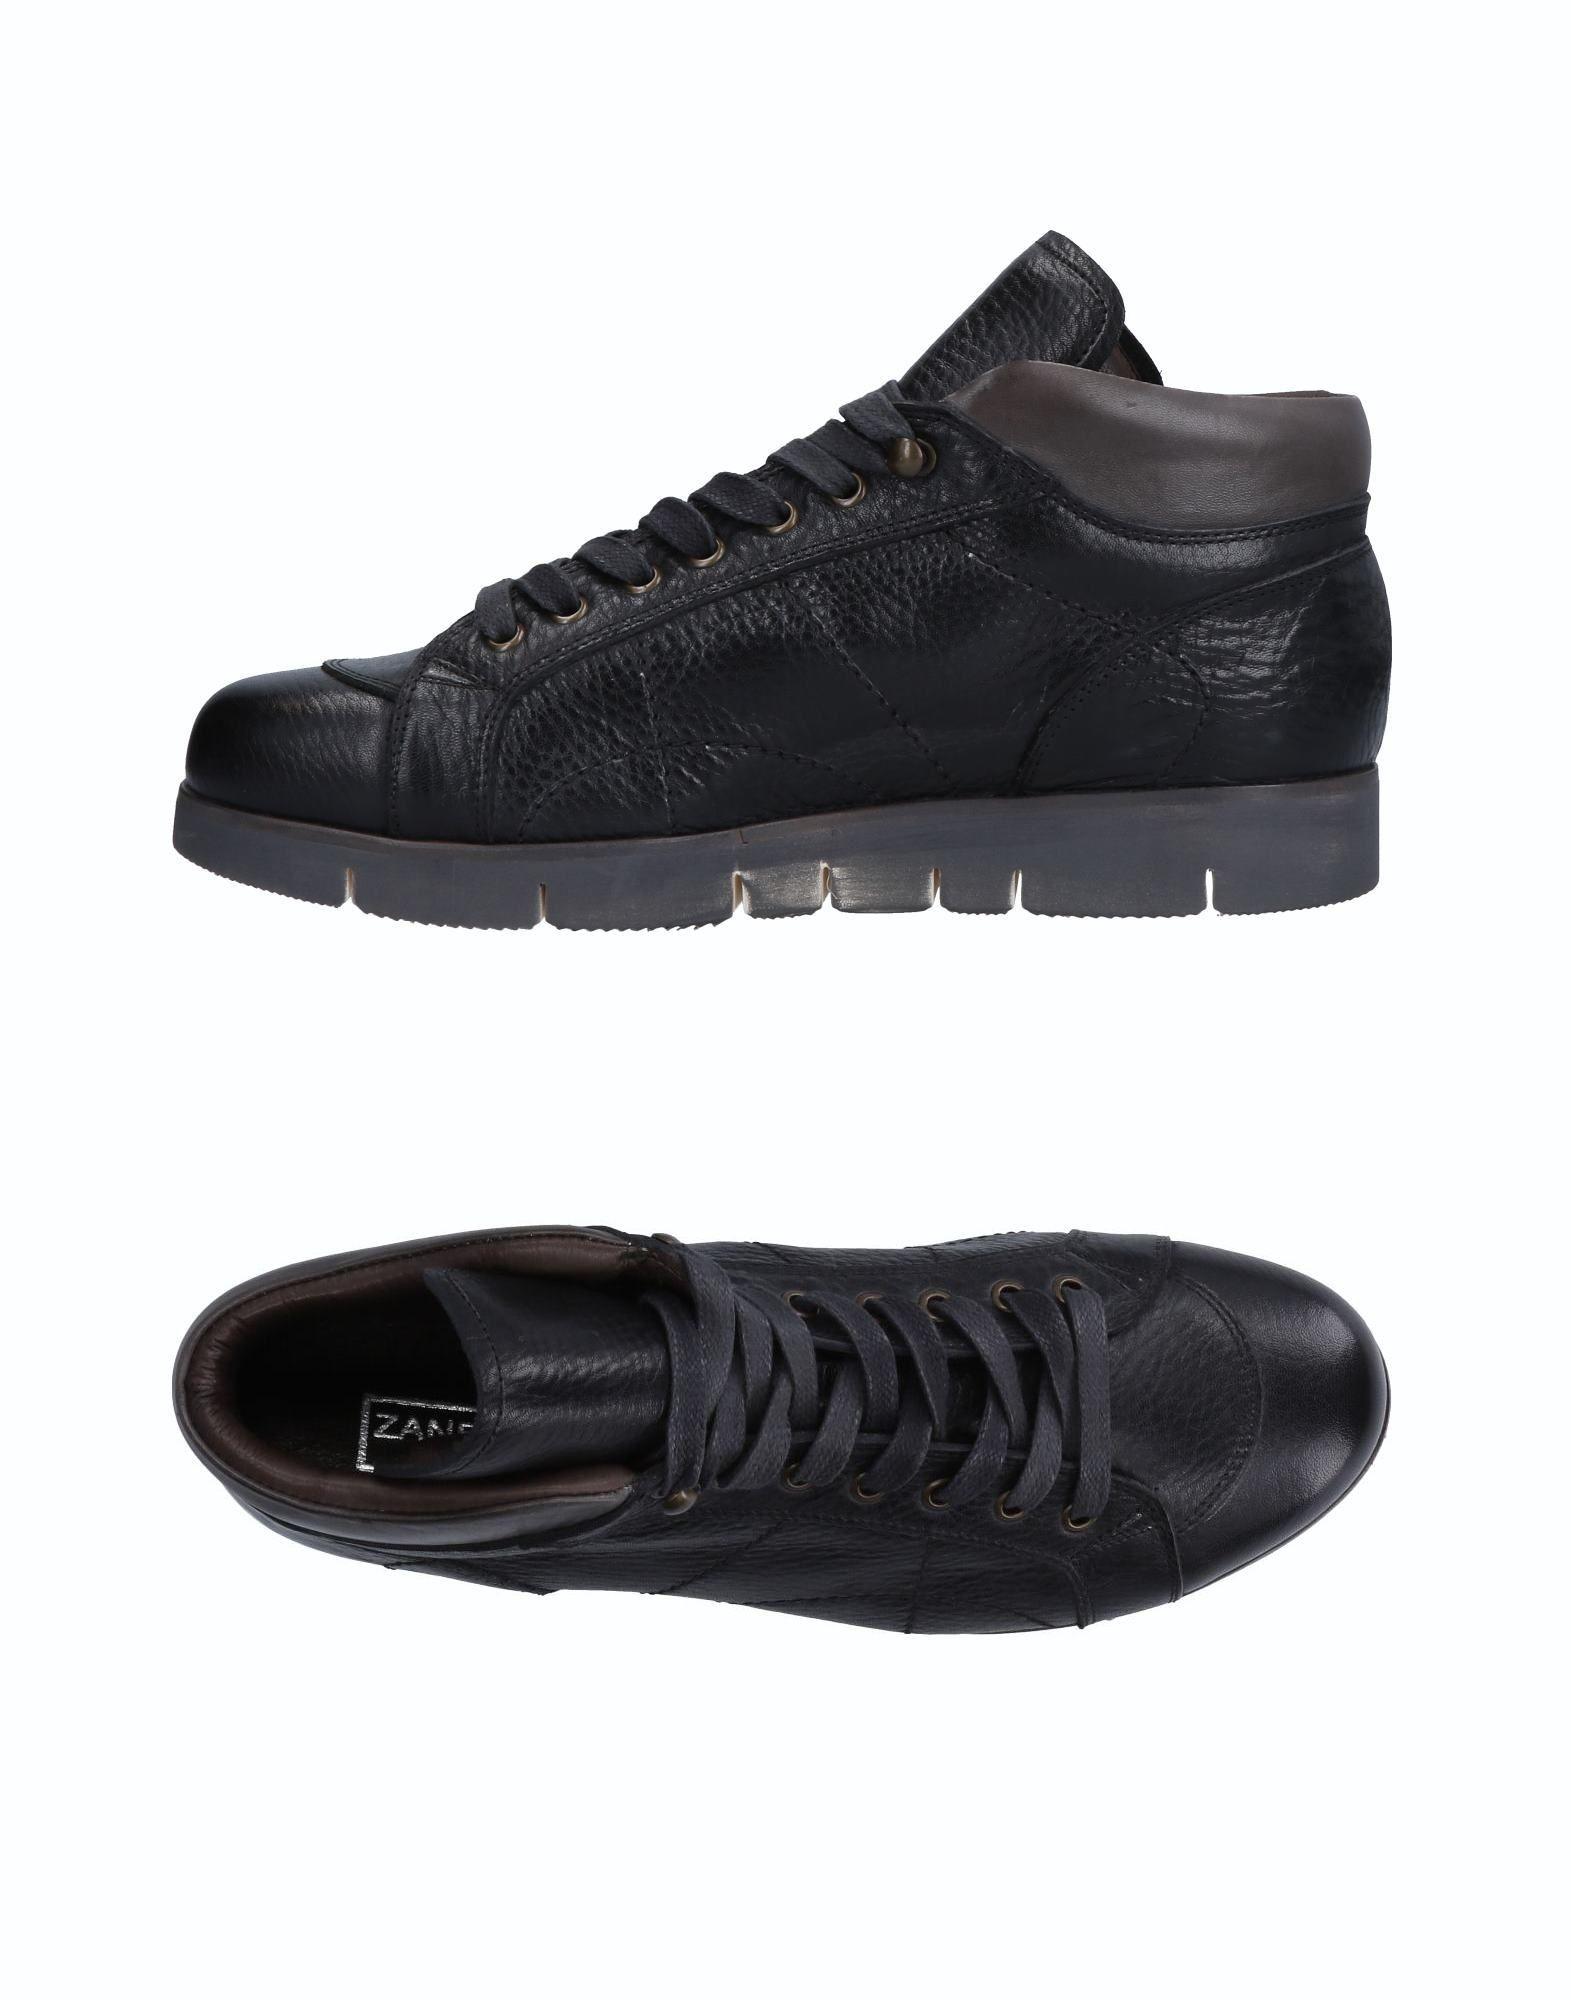 Zanfrini 11518861TC Cantù Sneakers Herren  11518861TC Zanfrini baf382